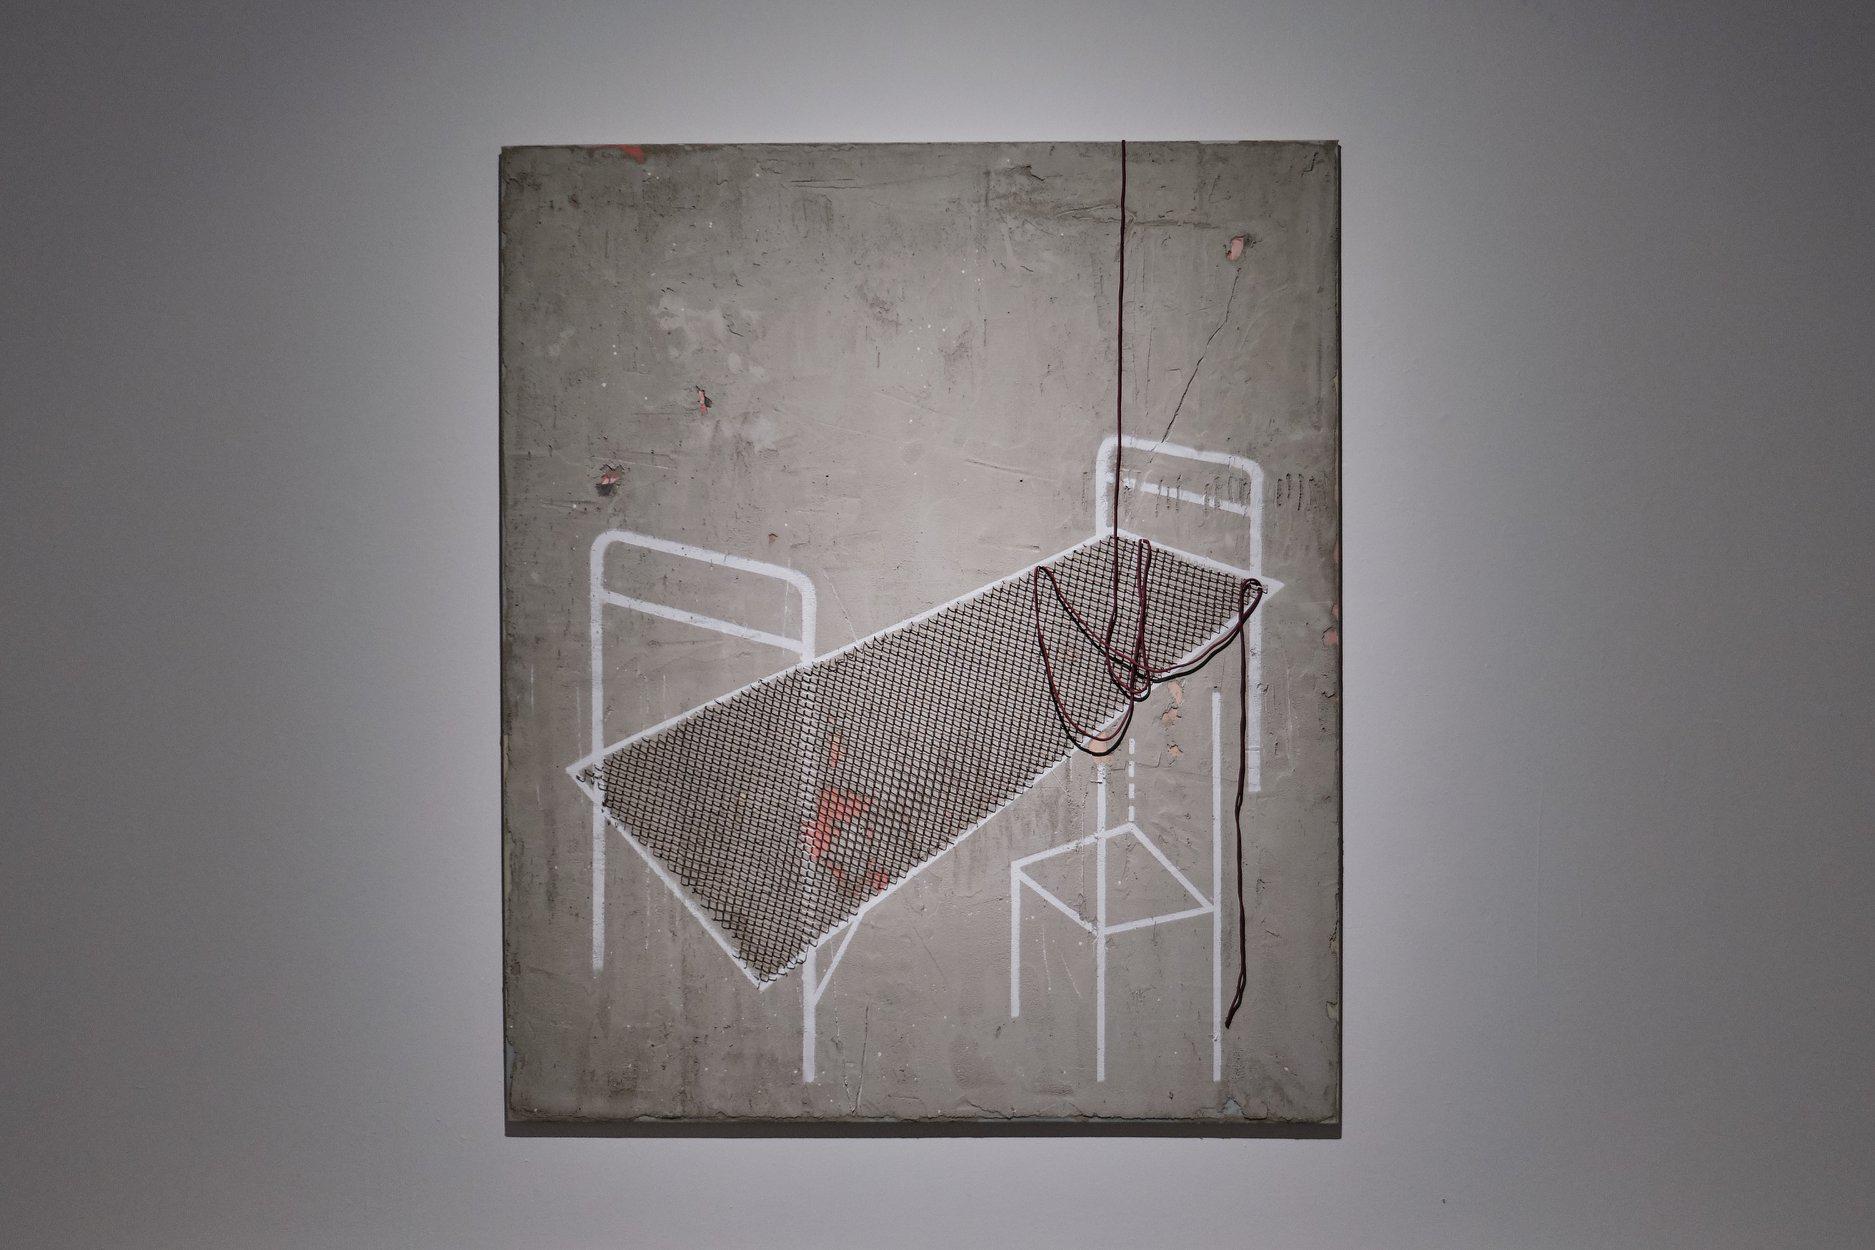 Dainius Trumpis. Premonition. 2017. Wood, canvas, acrylic, concrete, metal, synthetic string, mirror 200cm. x 160cm.